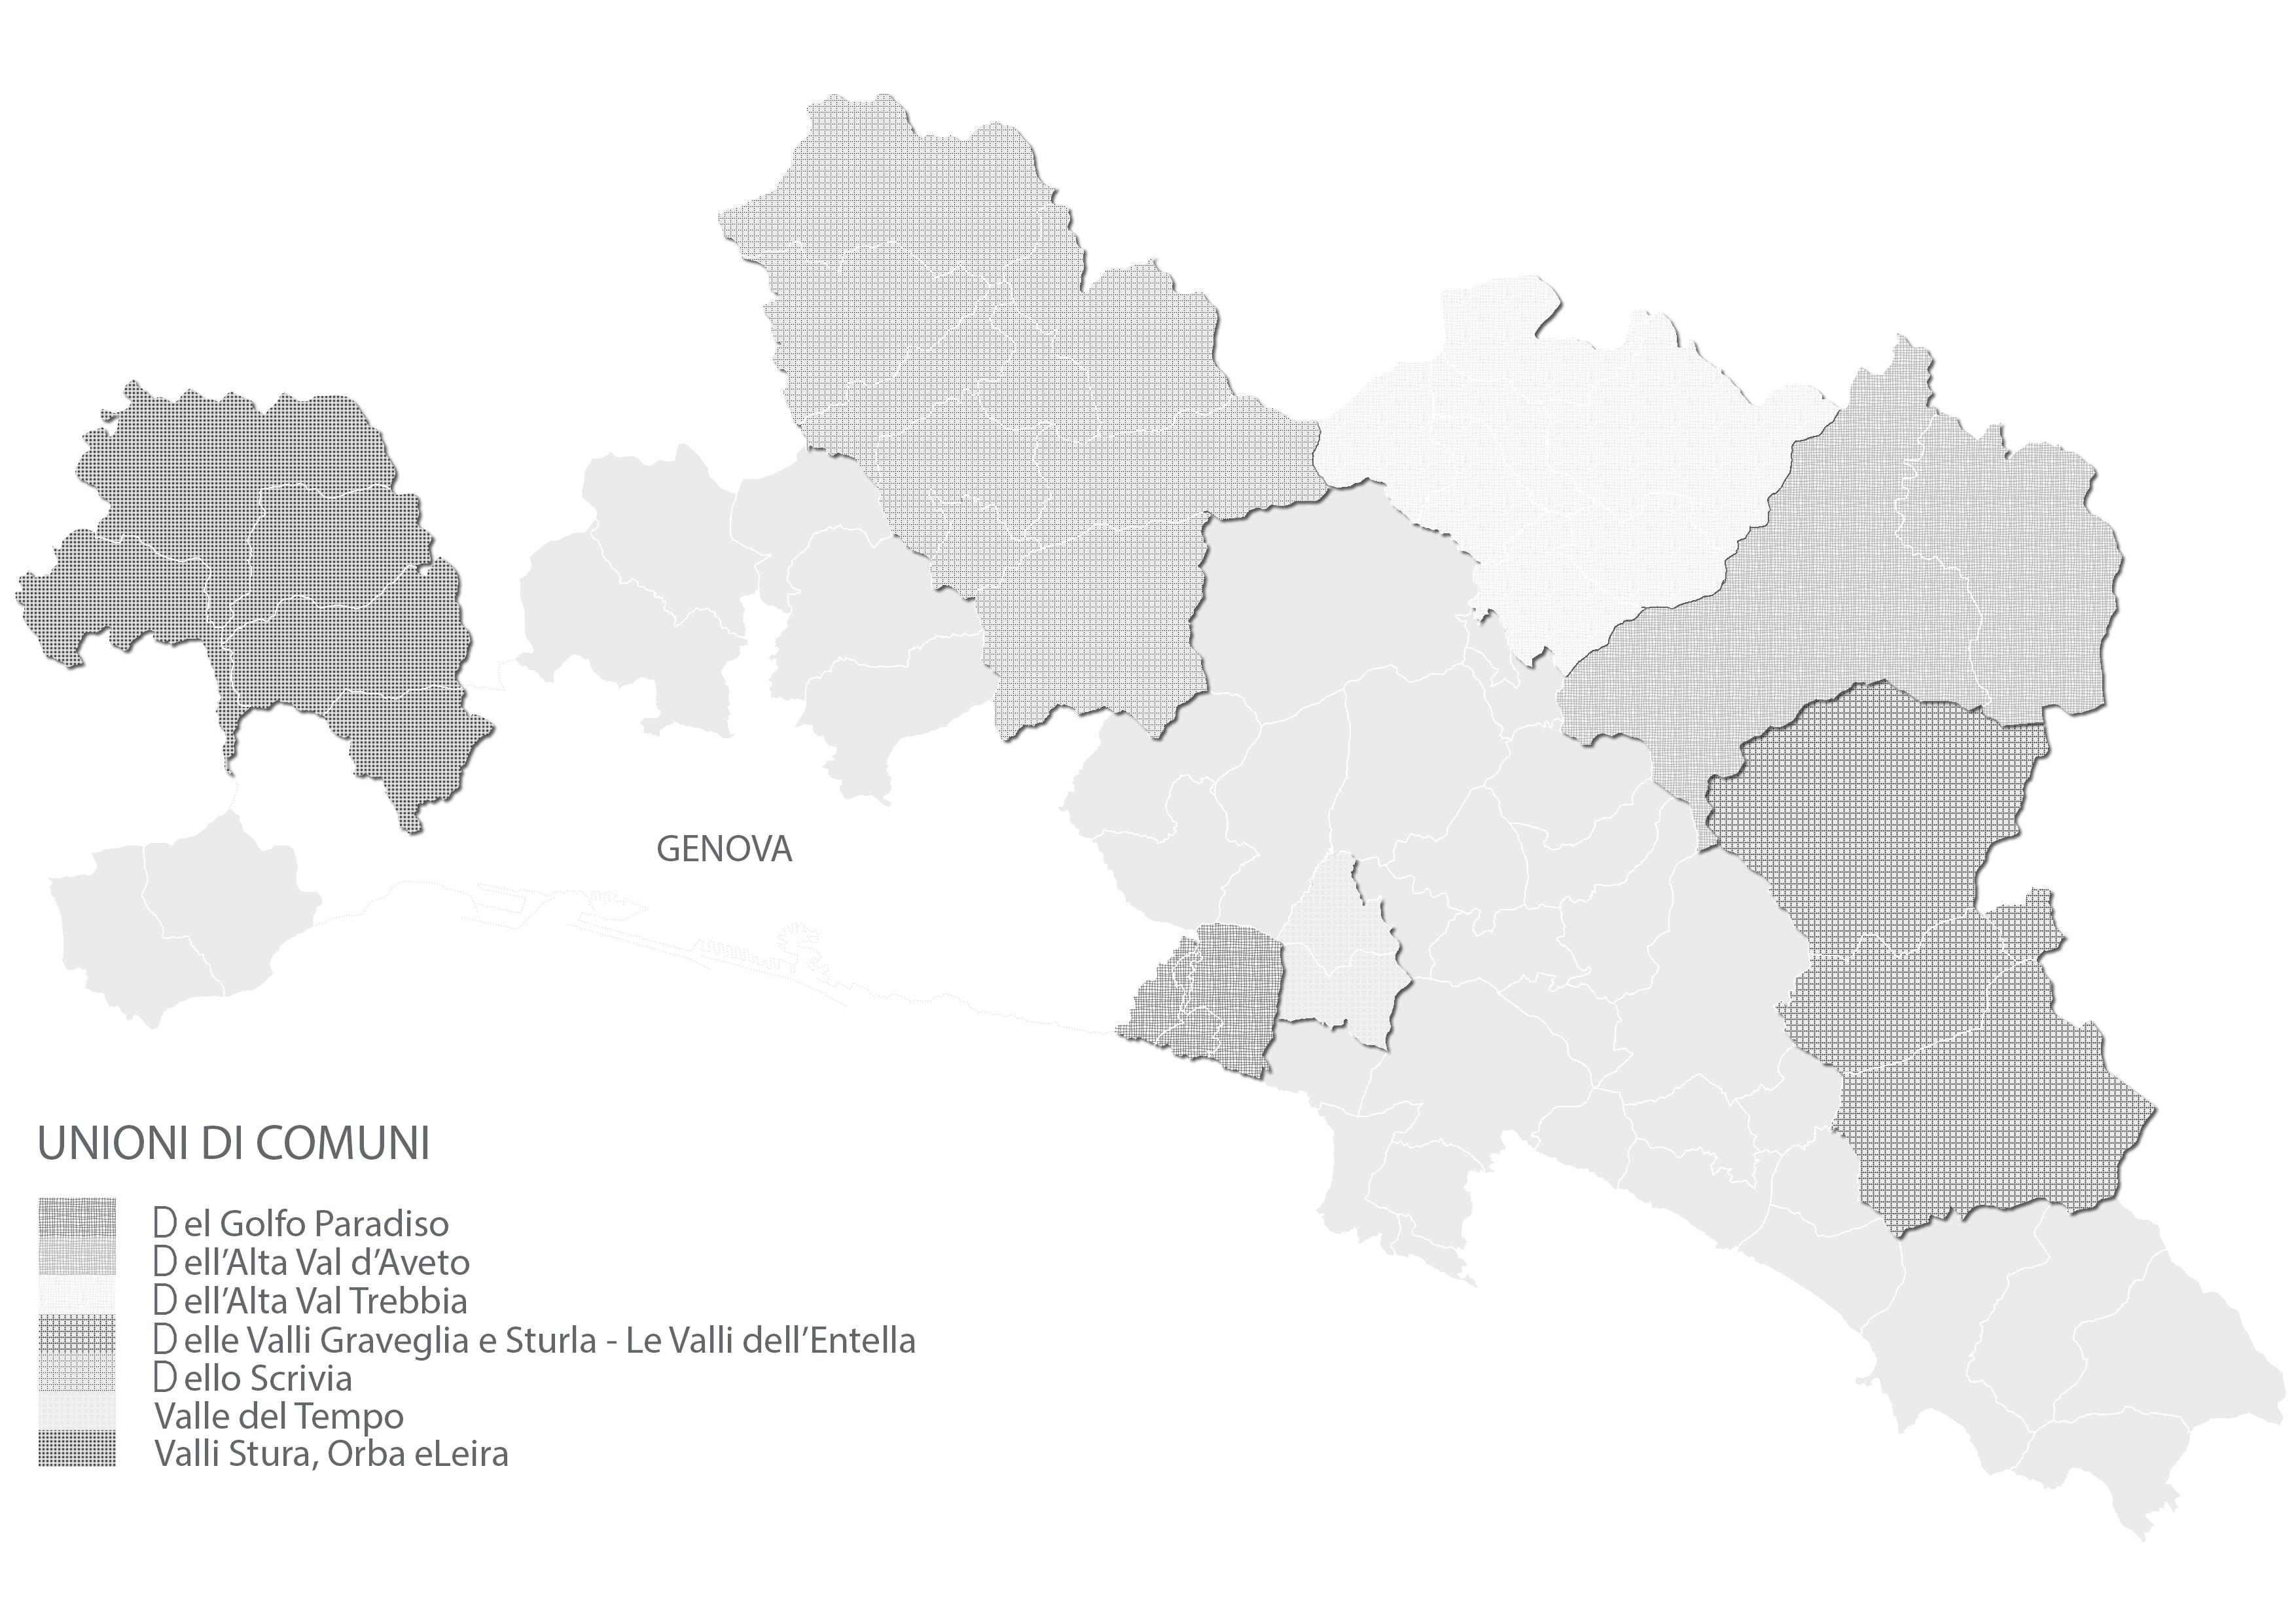 Unioni di Comuni - Città Metropolitana di Genova